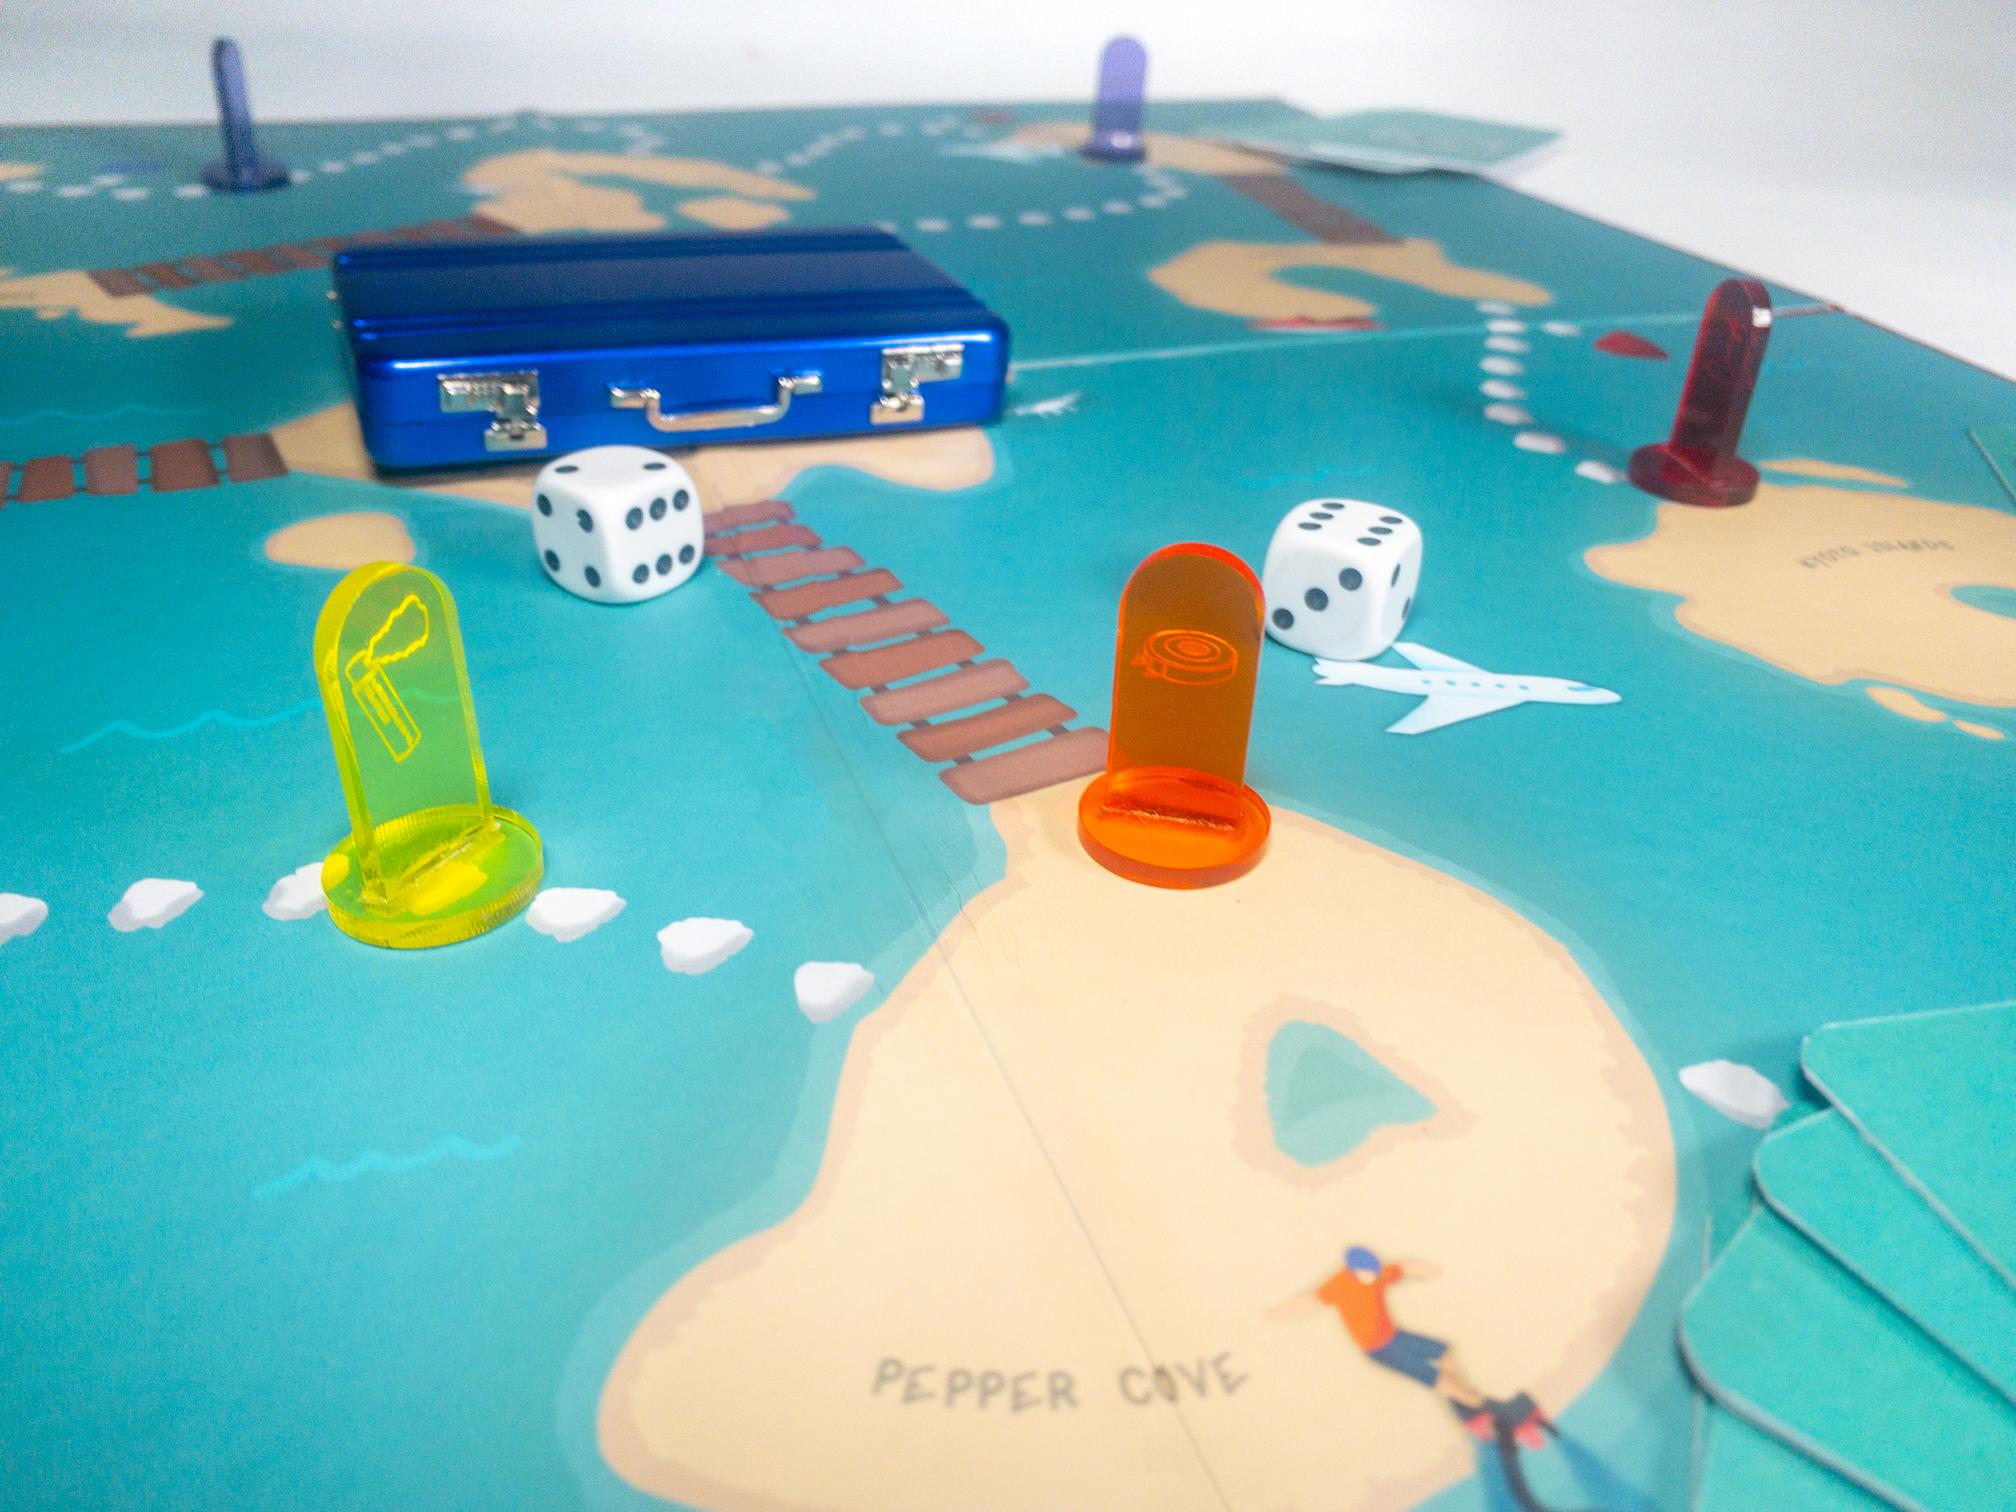 Beauty shot of board game